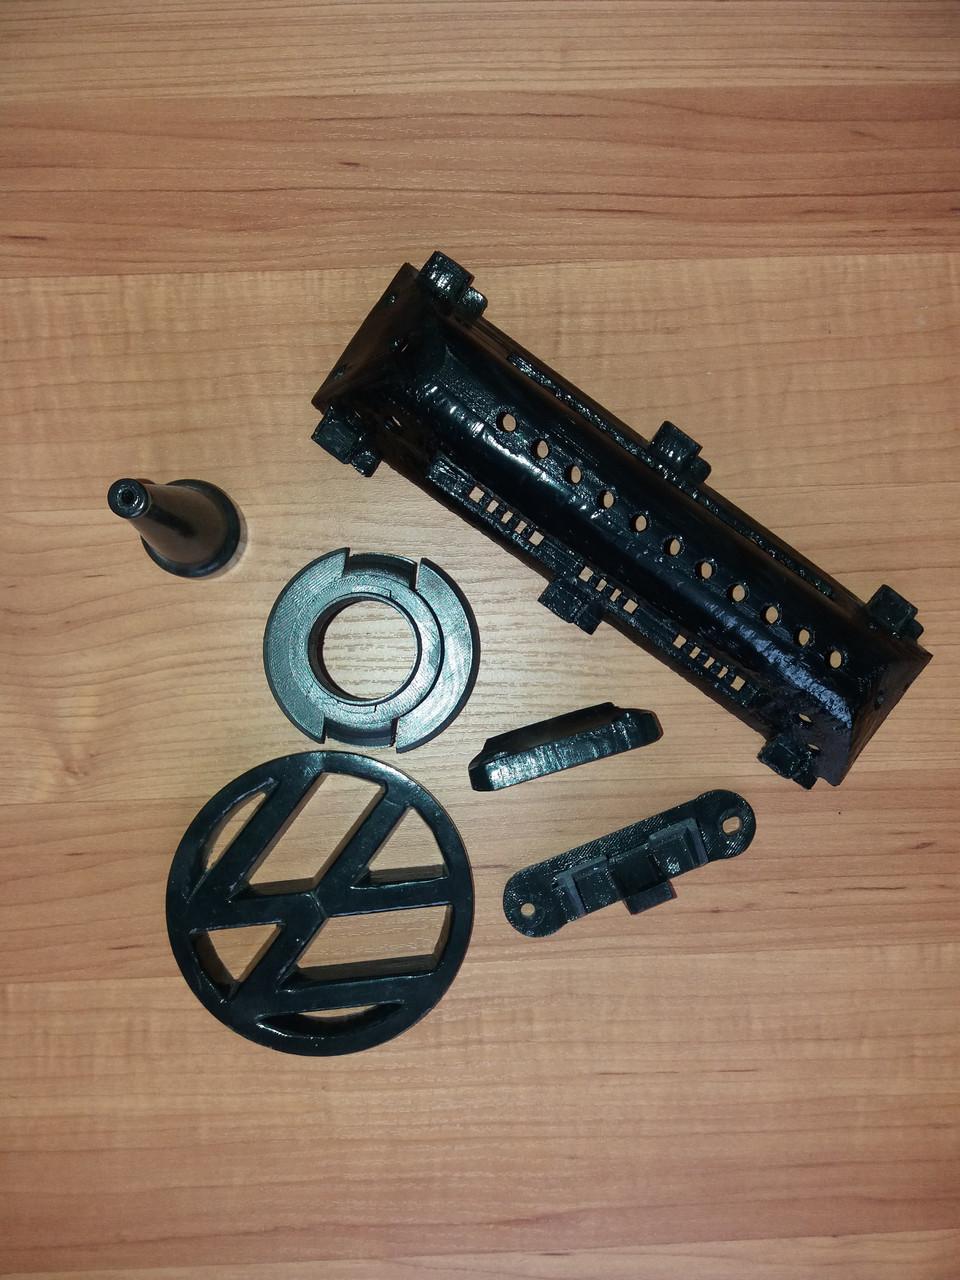 3Д друк механічних частин